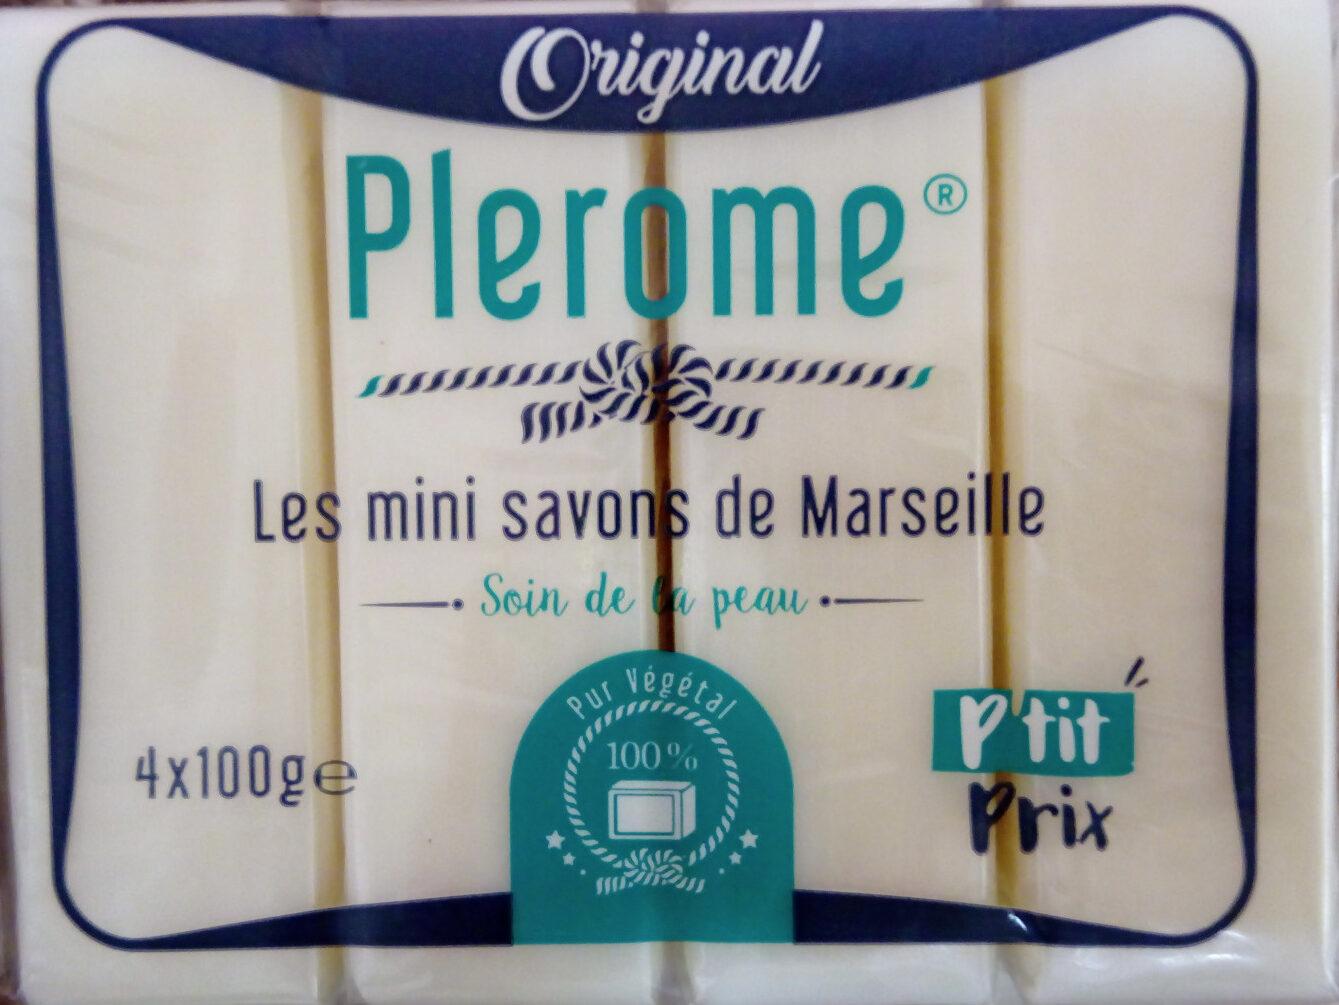 Minis savons de Marseille - Product